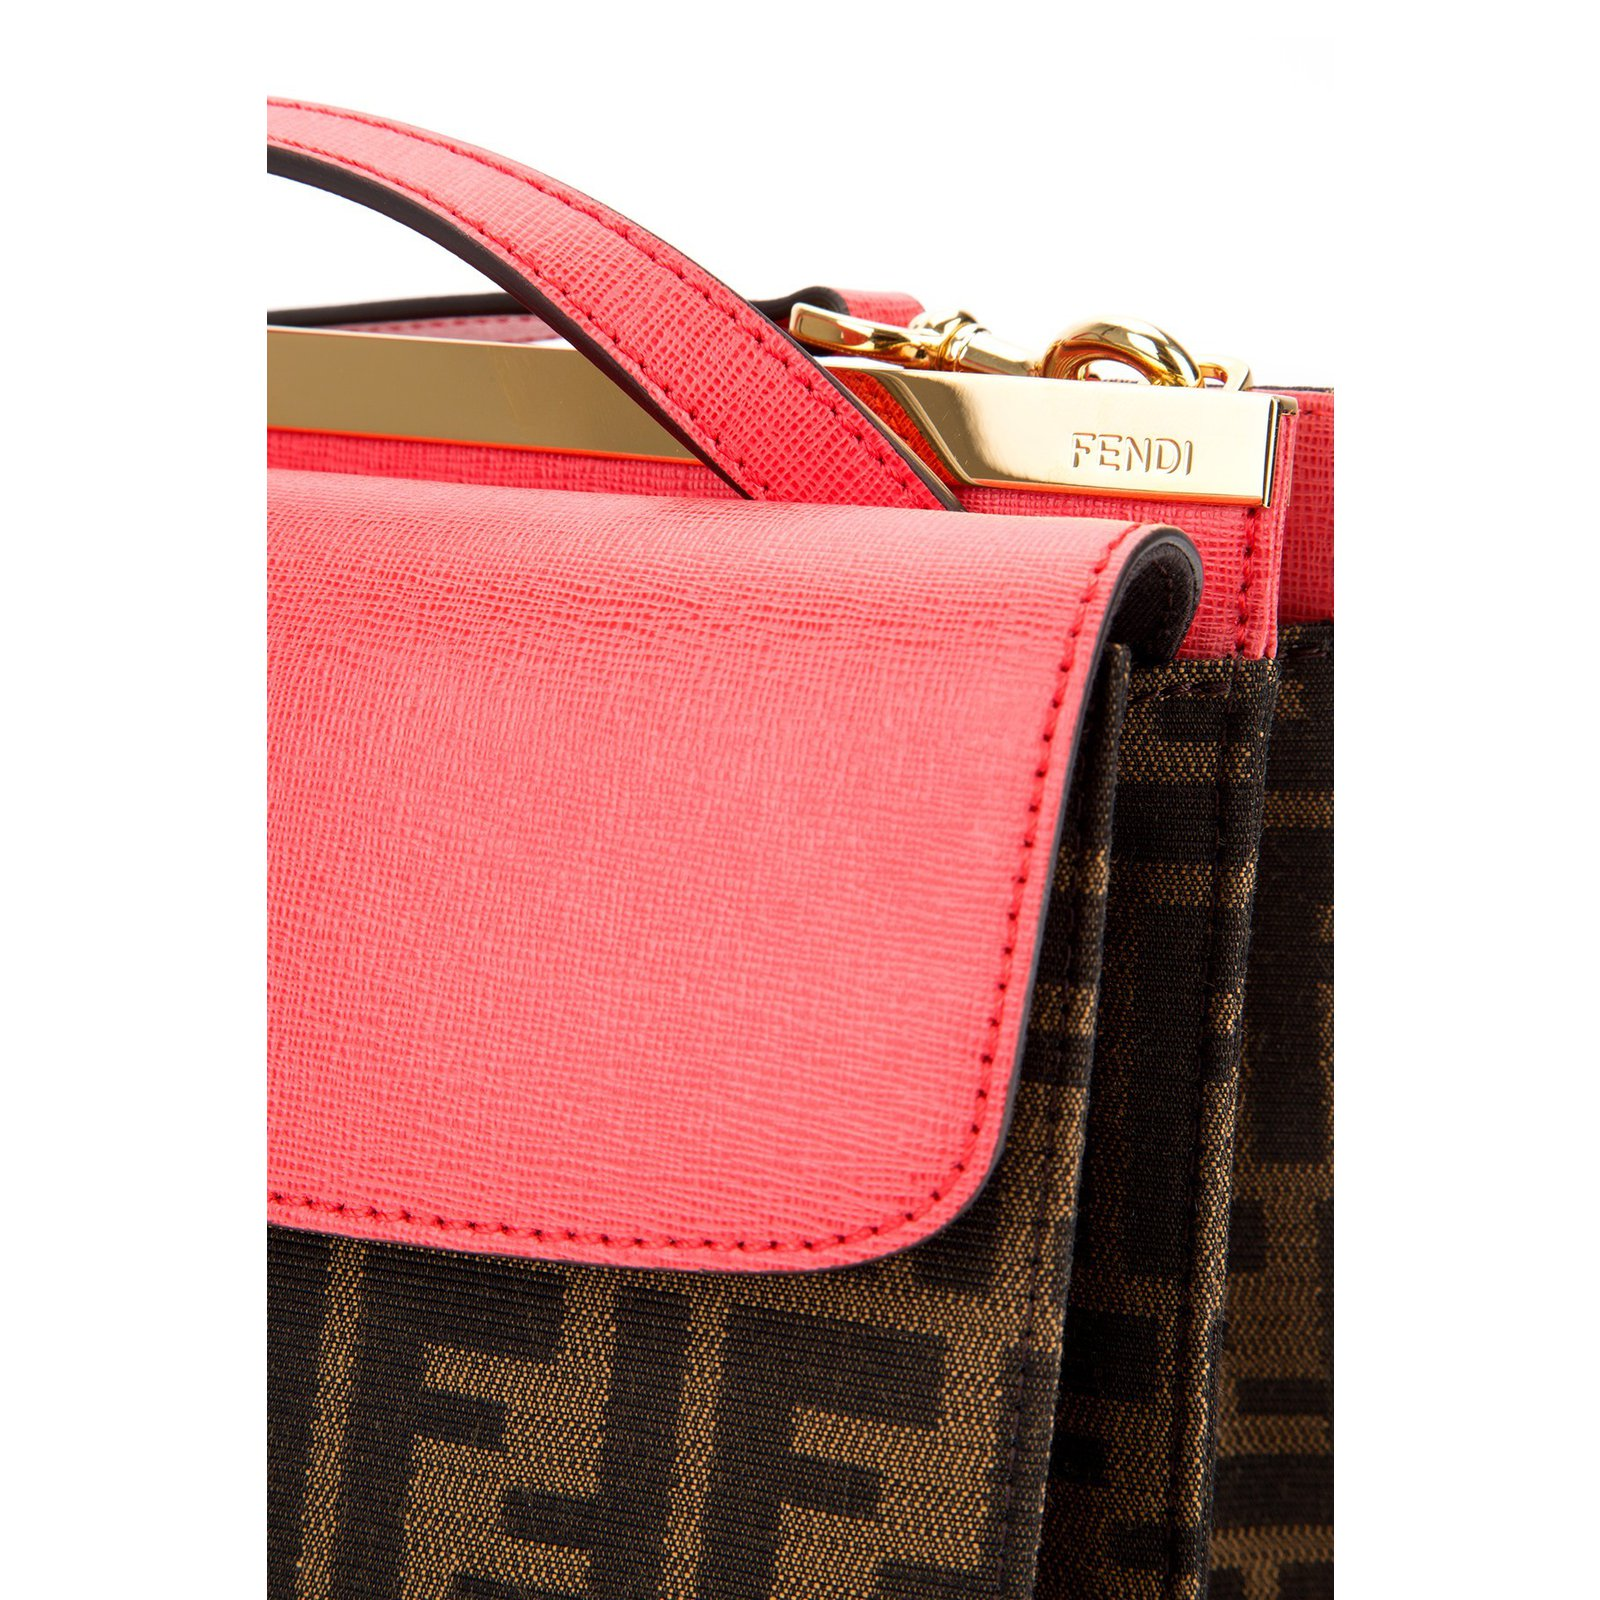 92729b863d8b Fendi Fendi handbag Demi jour zucca Handbags Leather Brown